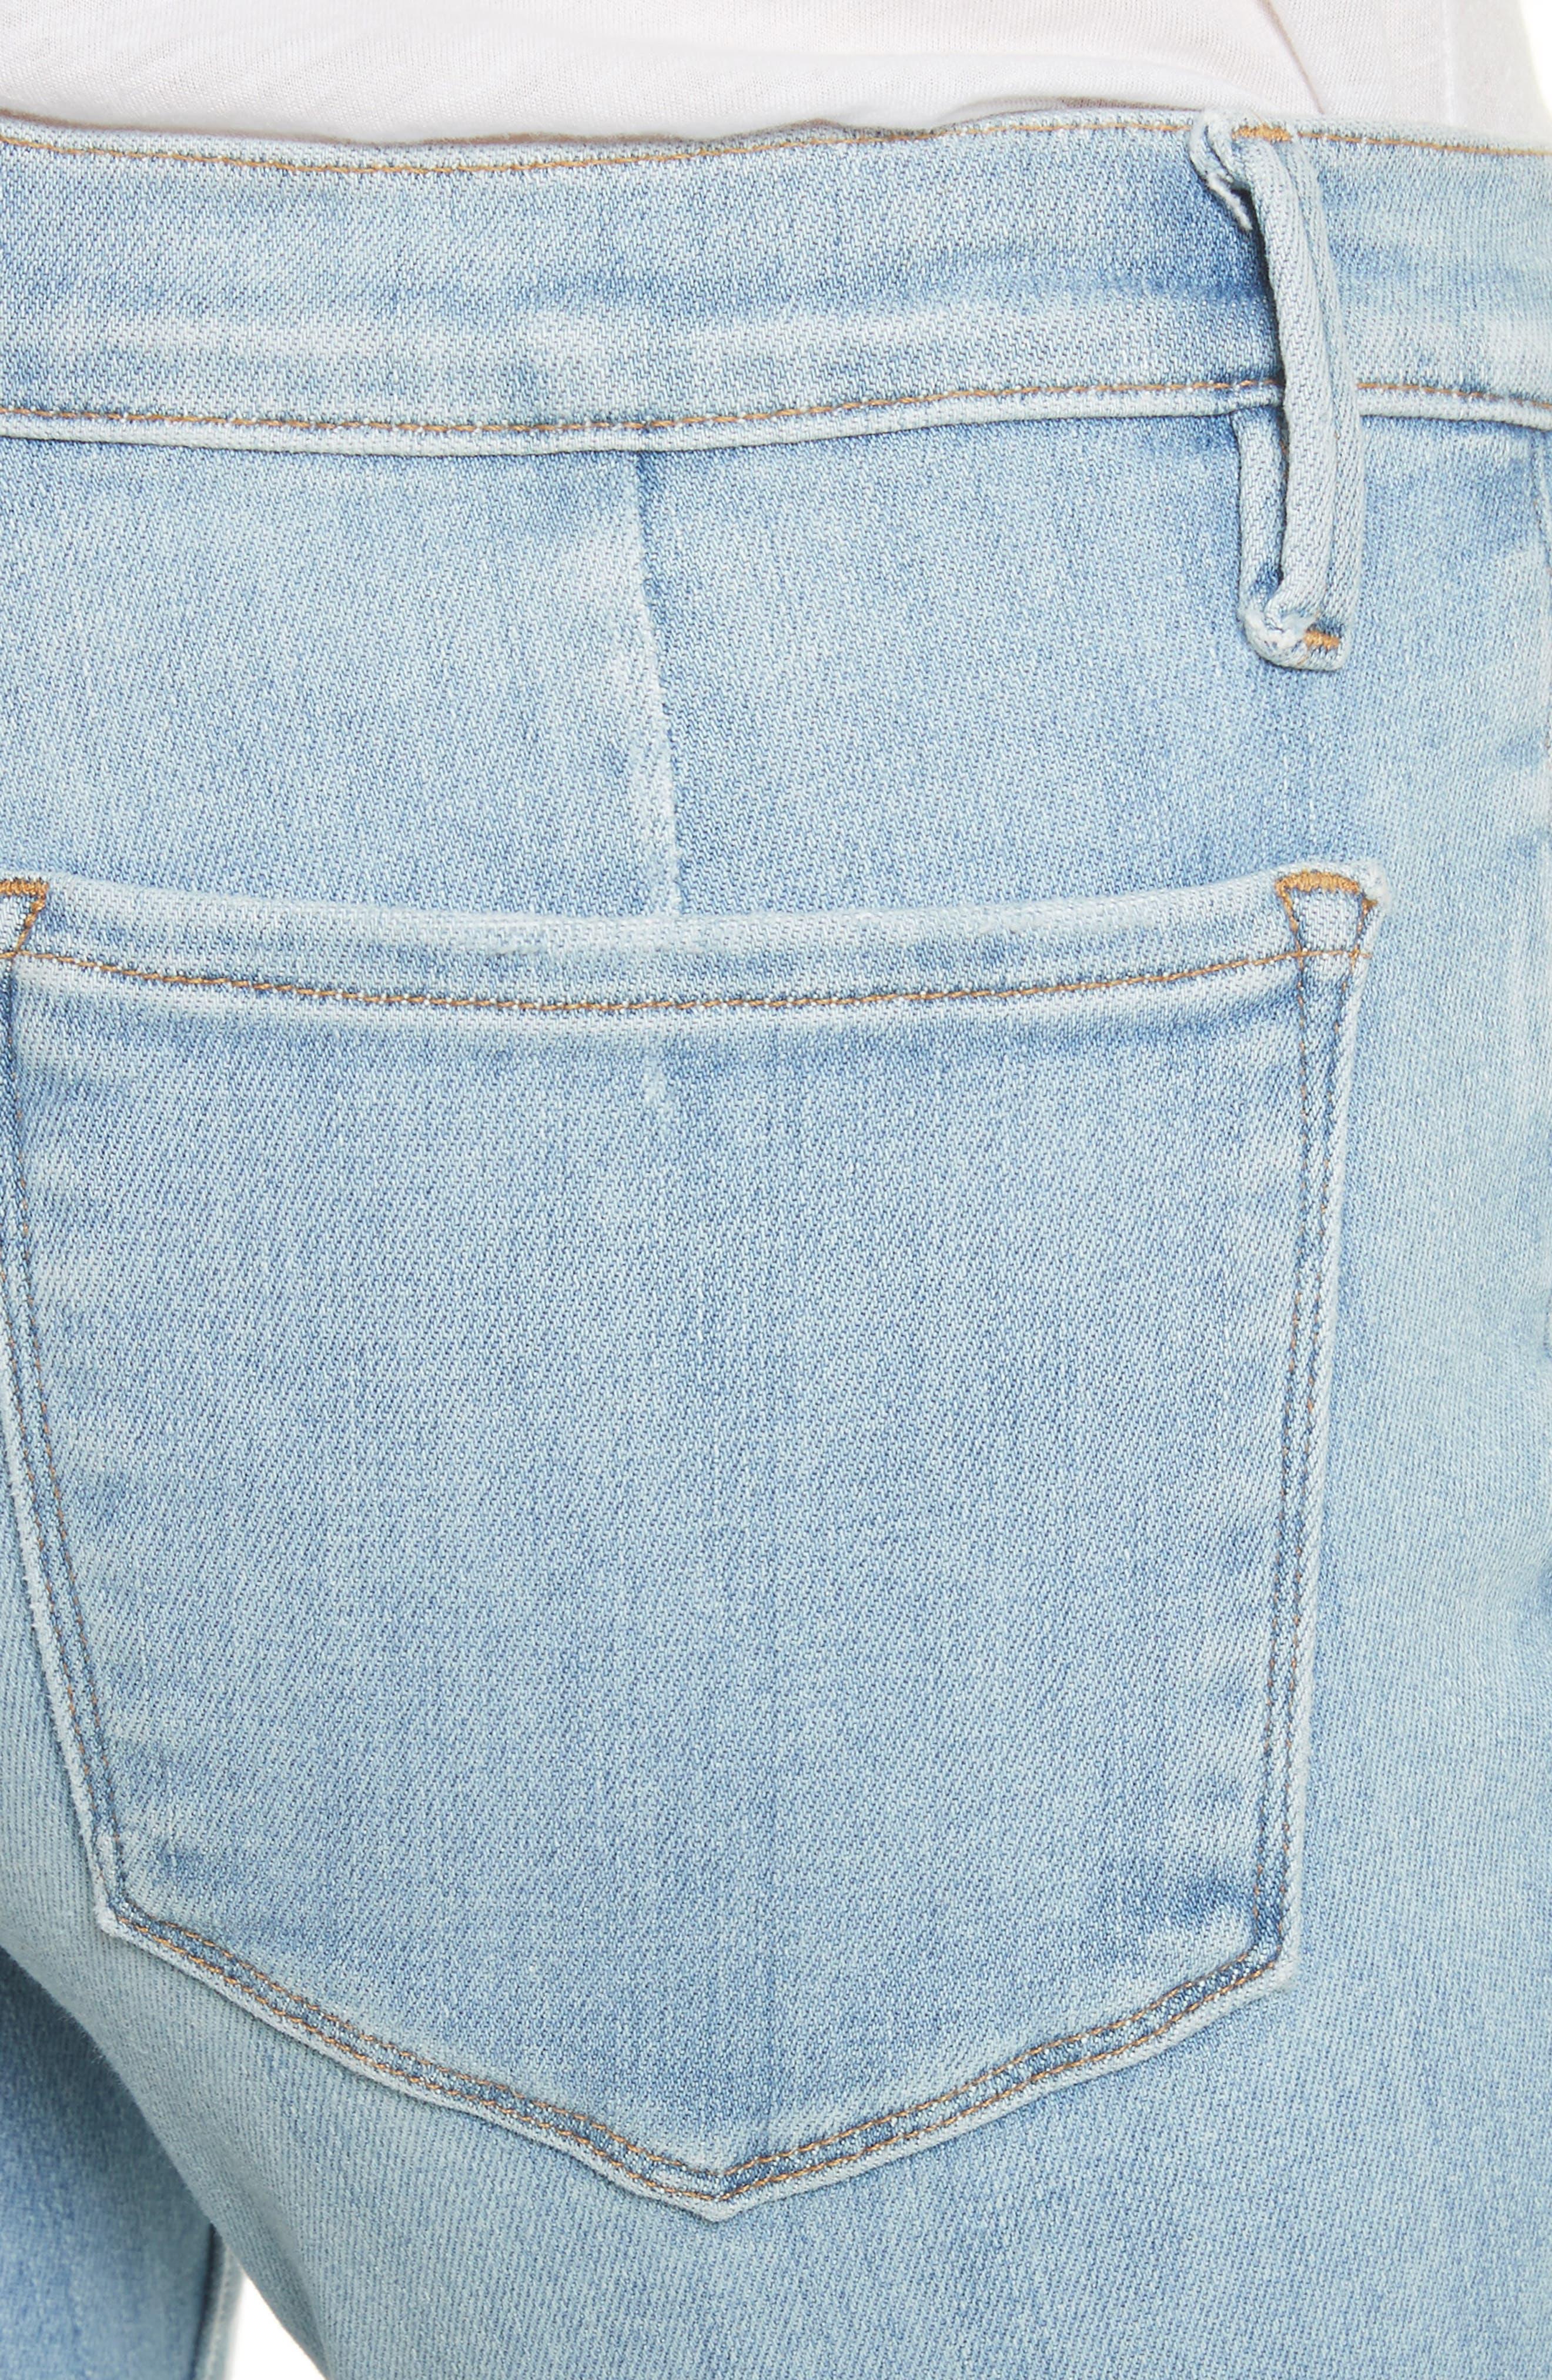 Le Skinny de Jeanne Flounce Skinny Jeans,                             Alternate thumbnail 4, color,                             Limer Stone